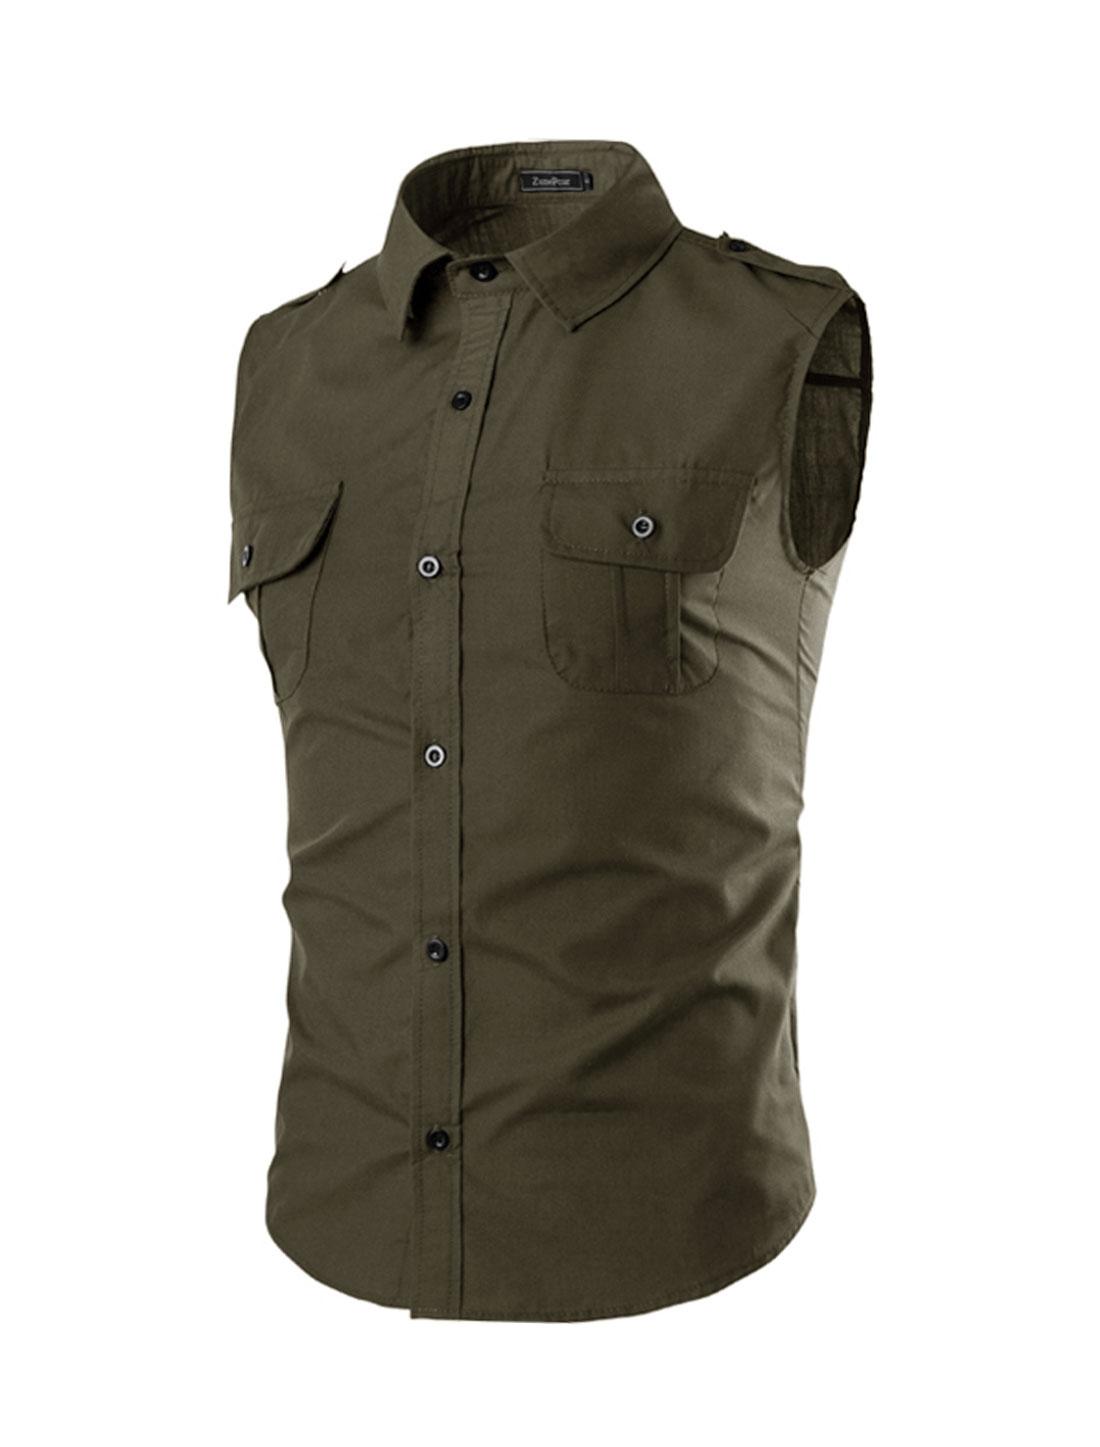 Men Flap Chest Pocket Button Closure Sleeveless Shirt Brown M